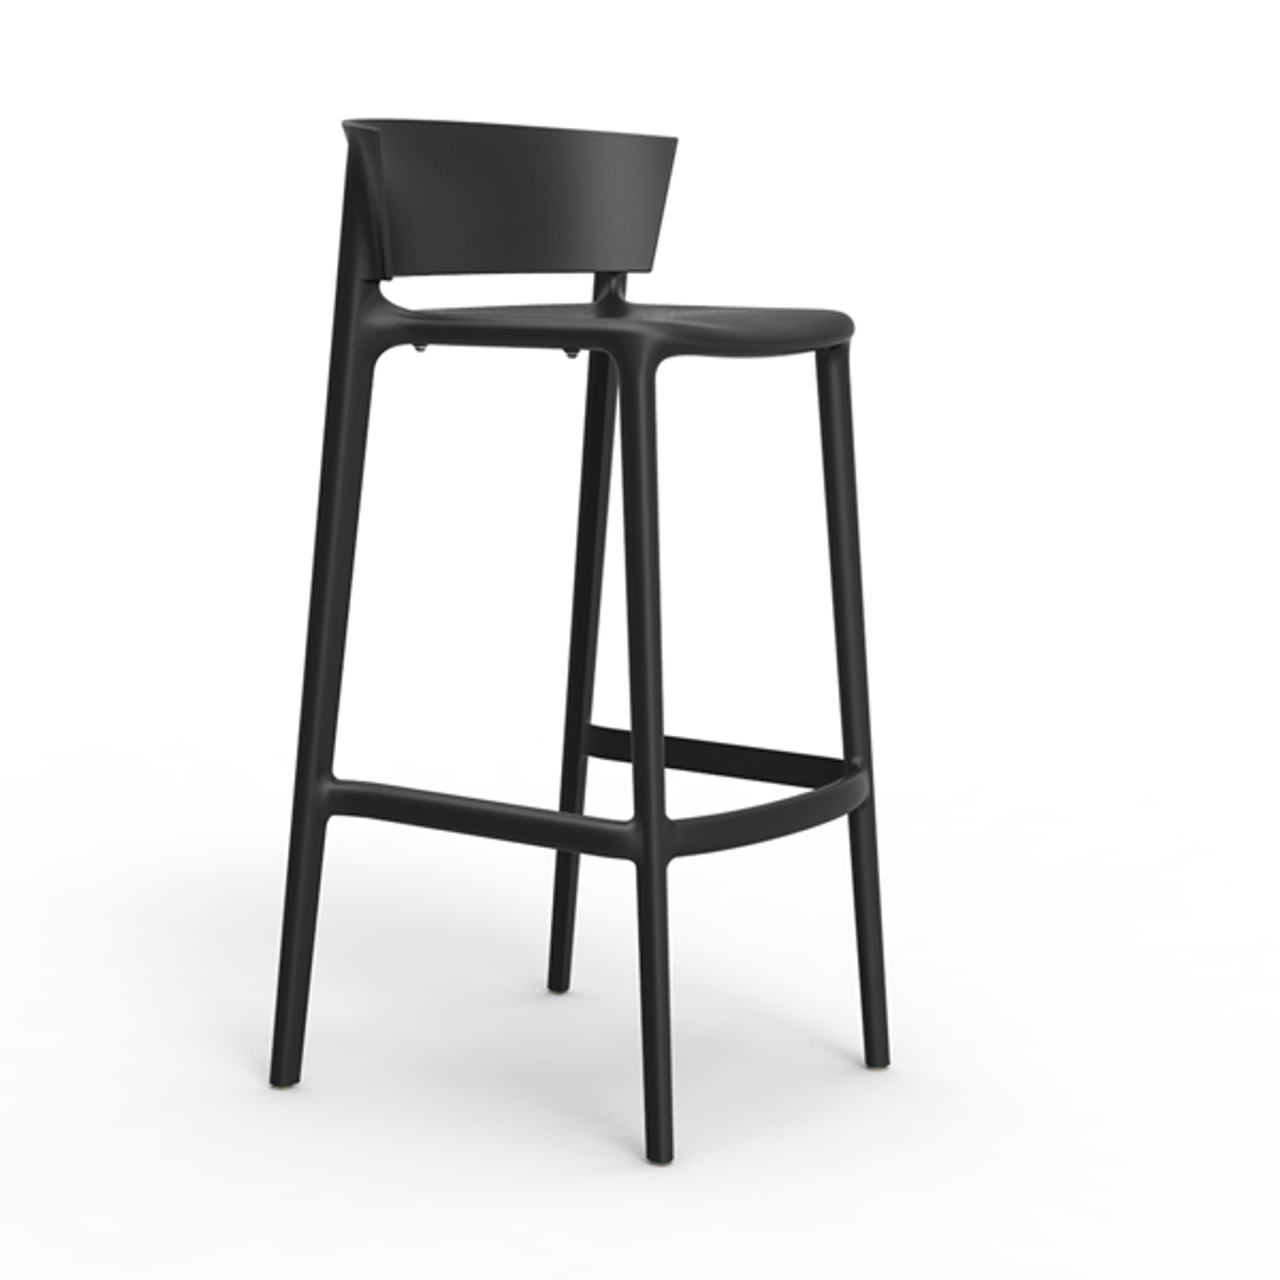 Awe Inspiring Africa Bar Stool Set Of 4 Gamerscity Chair Design For Home Gamerscityorg